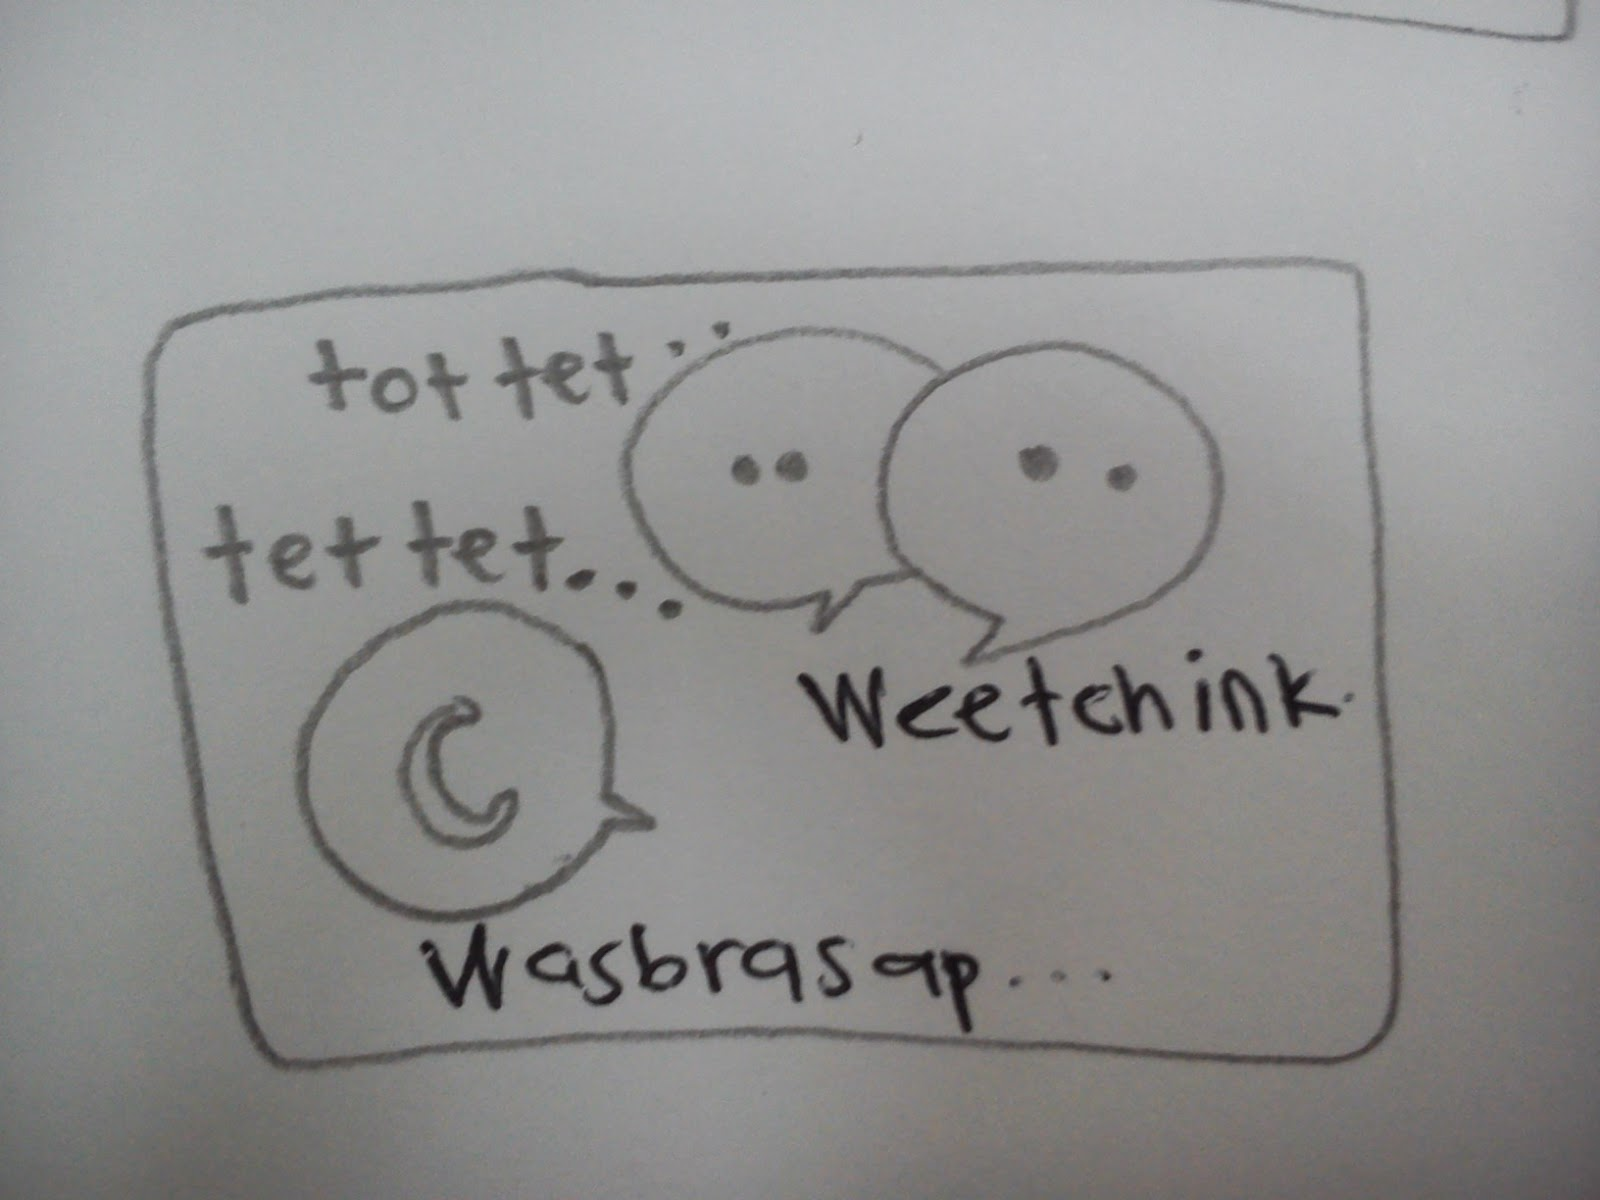 http://misscacacomot.blogspot.com/